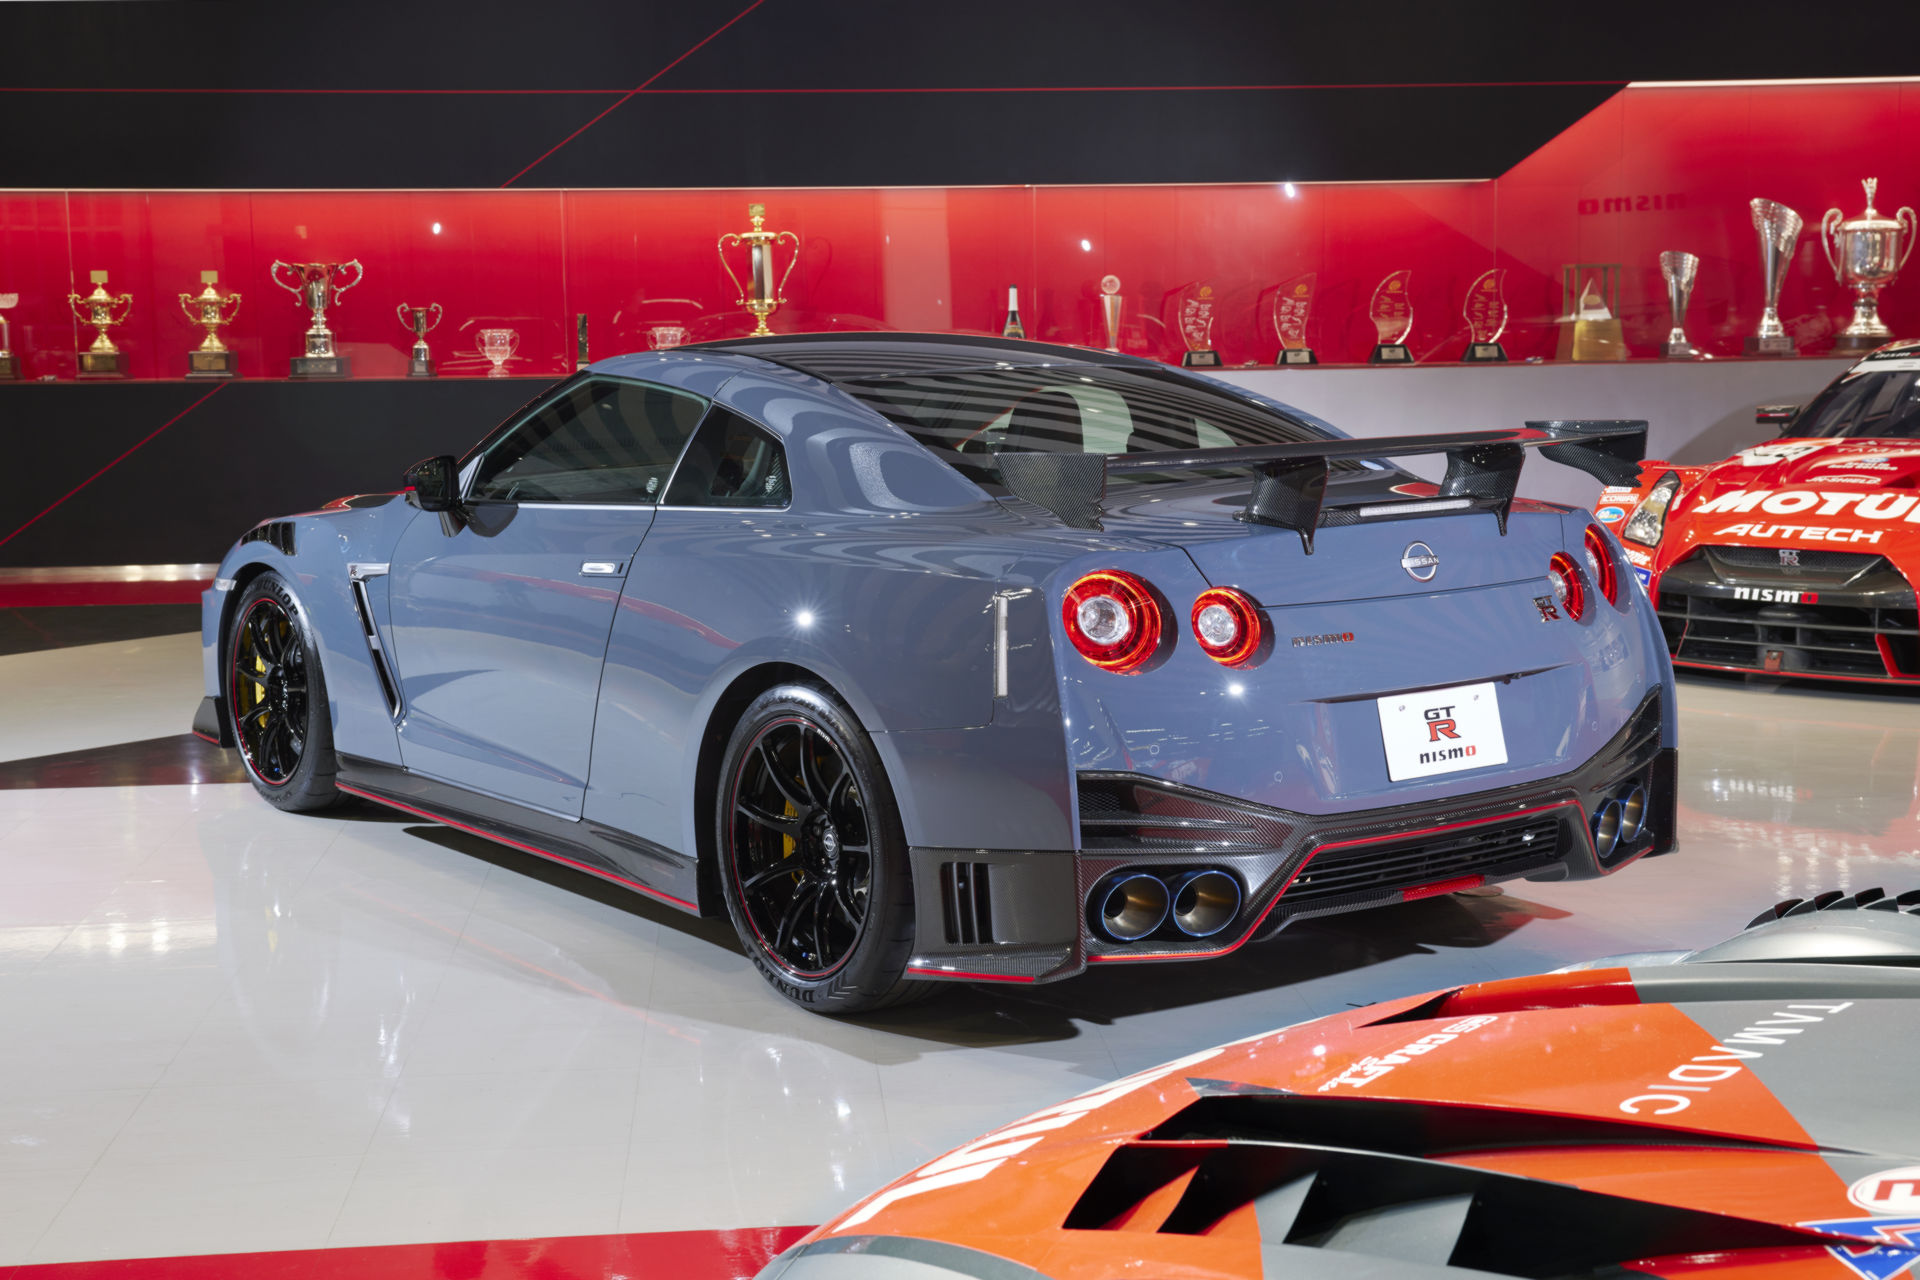 2022-Nissan-GT-R-Nismo-4.jpg